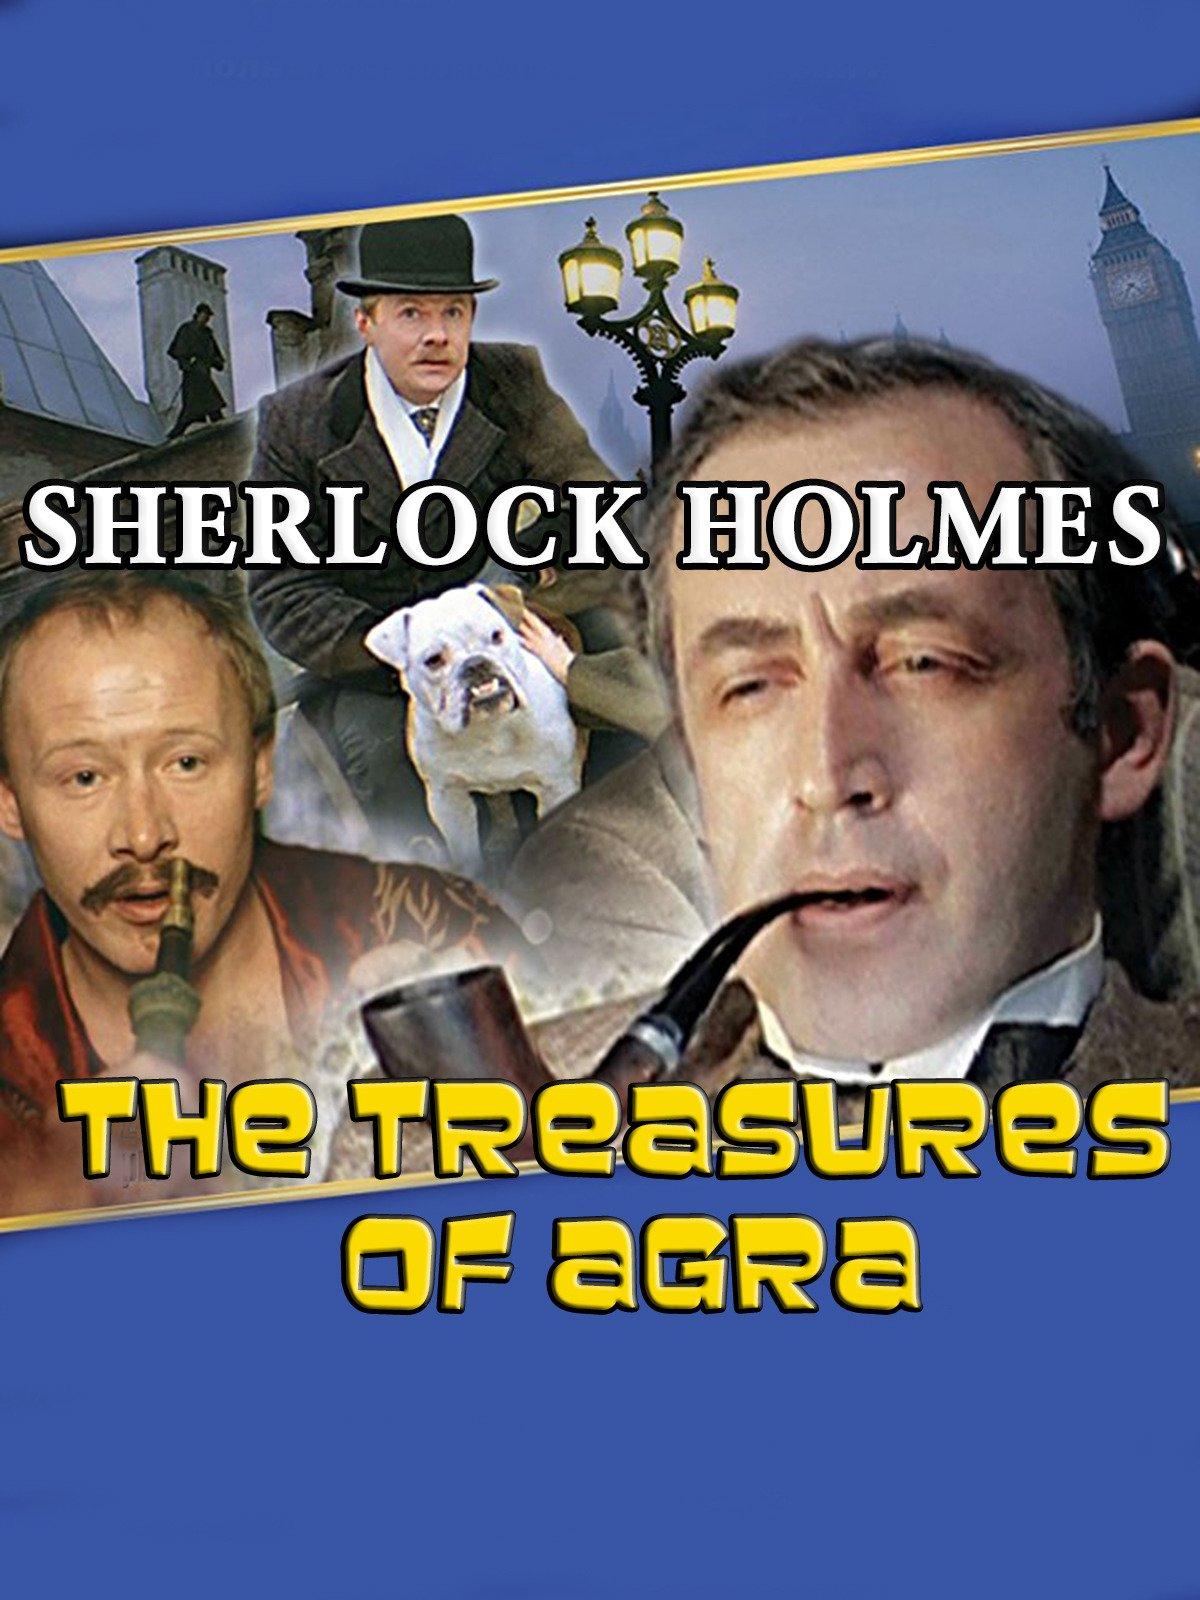 watch sherlock holmes the treasures of agra on amazon